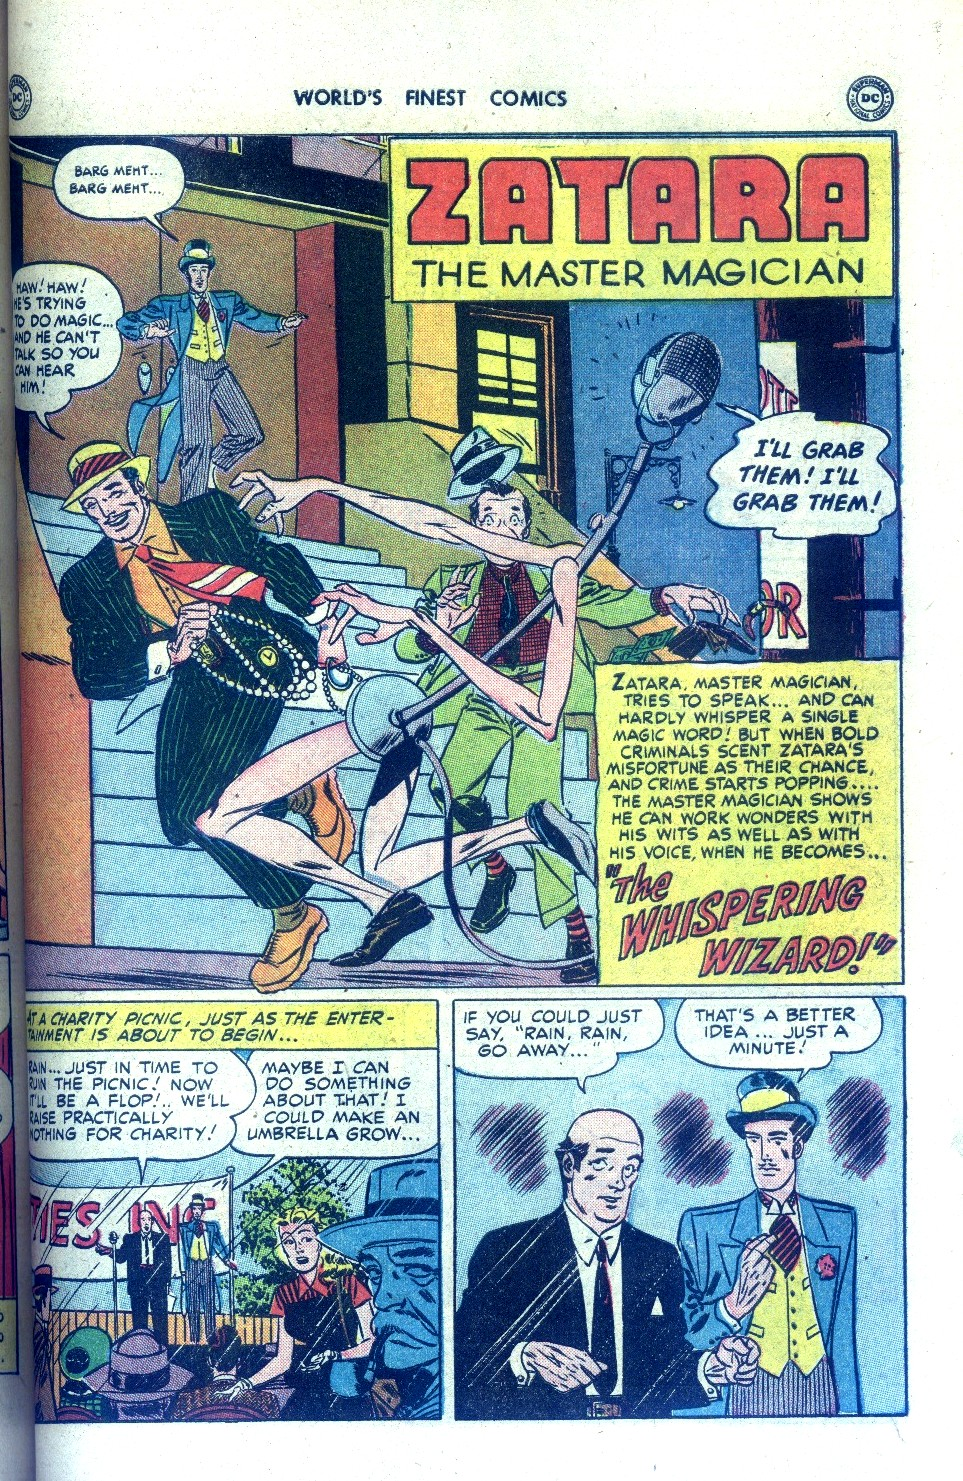 Read online World's Finest Comics comic -  Issue #43 - 51